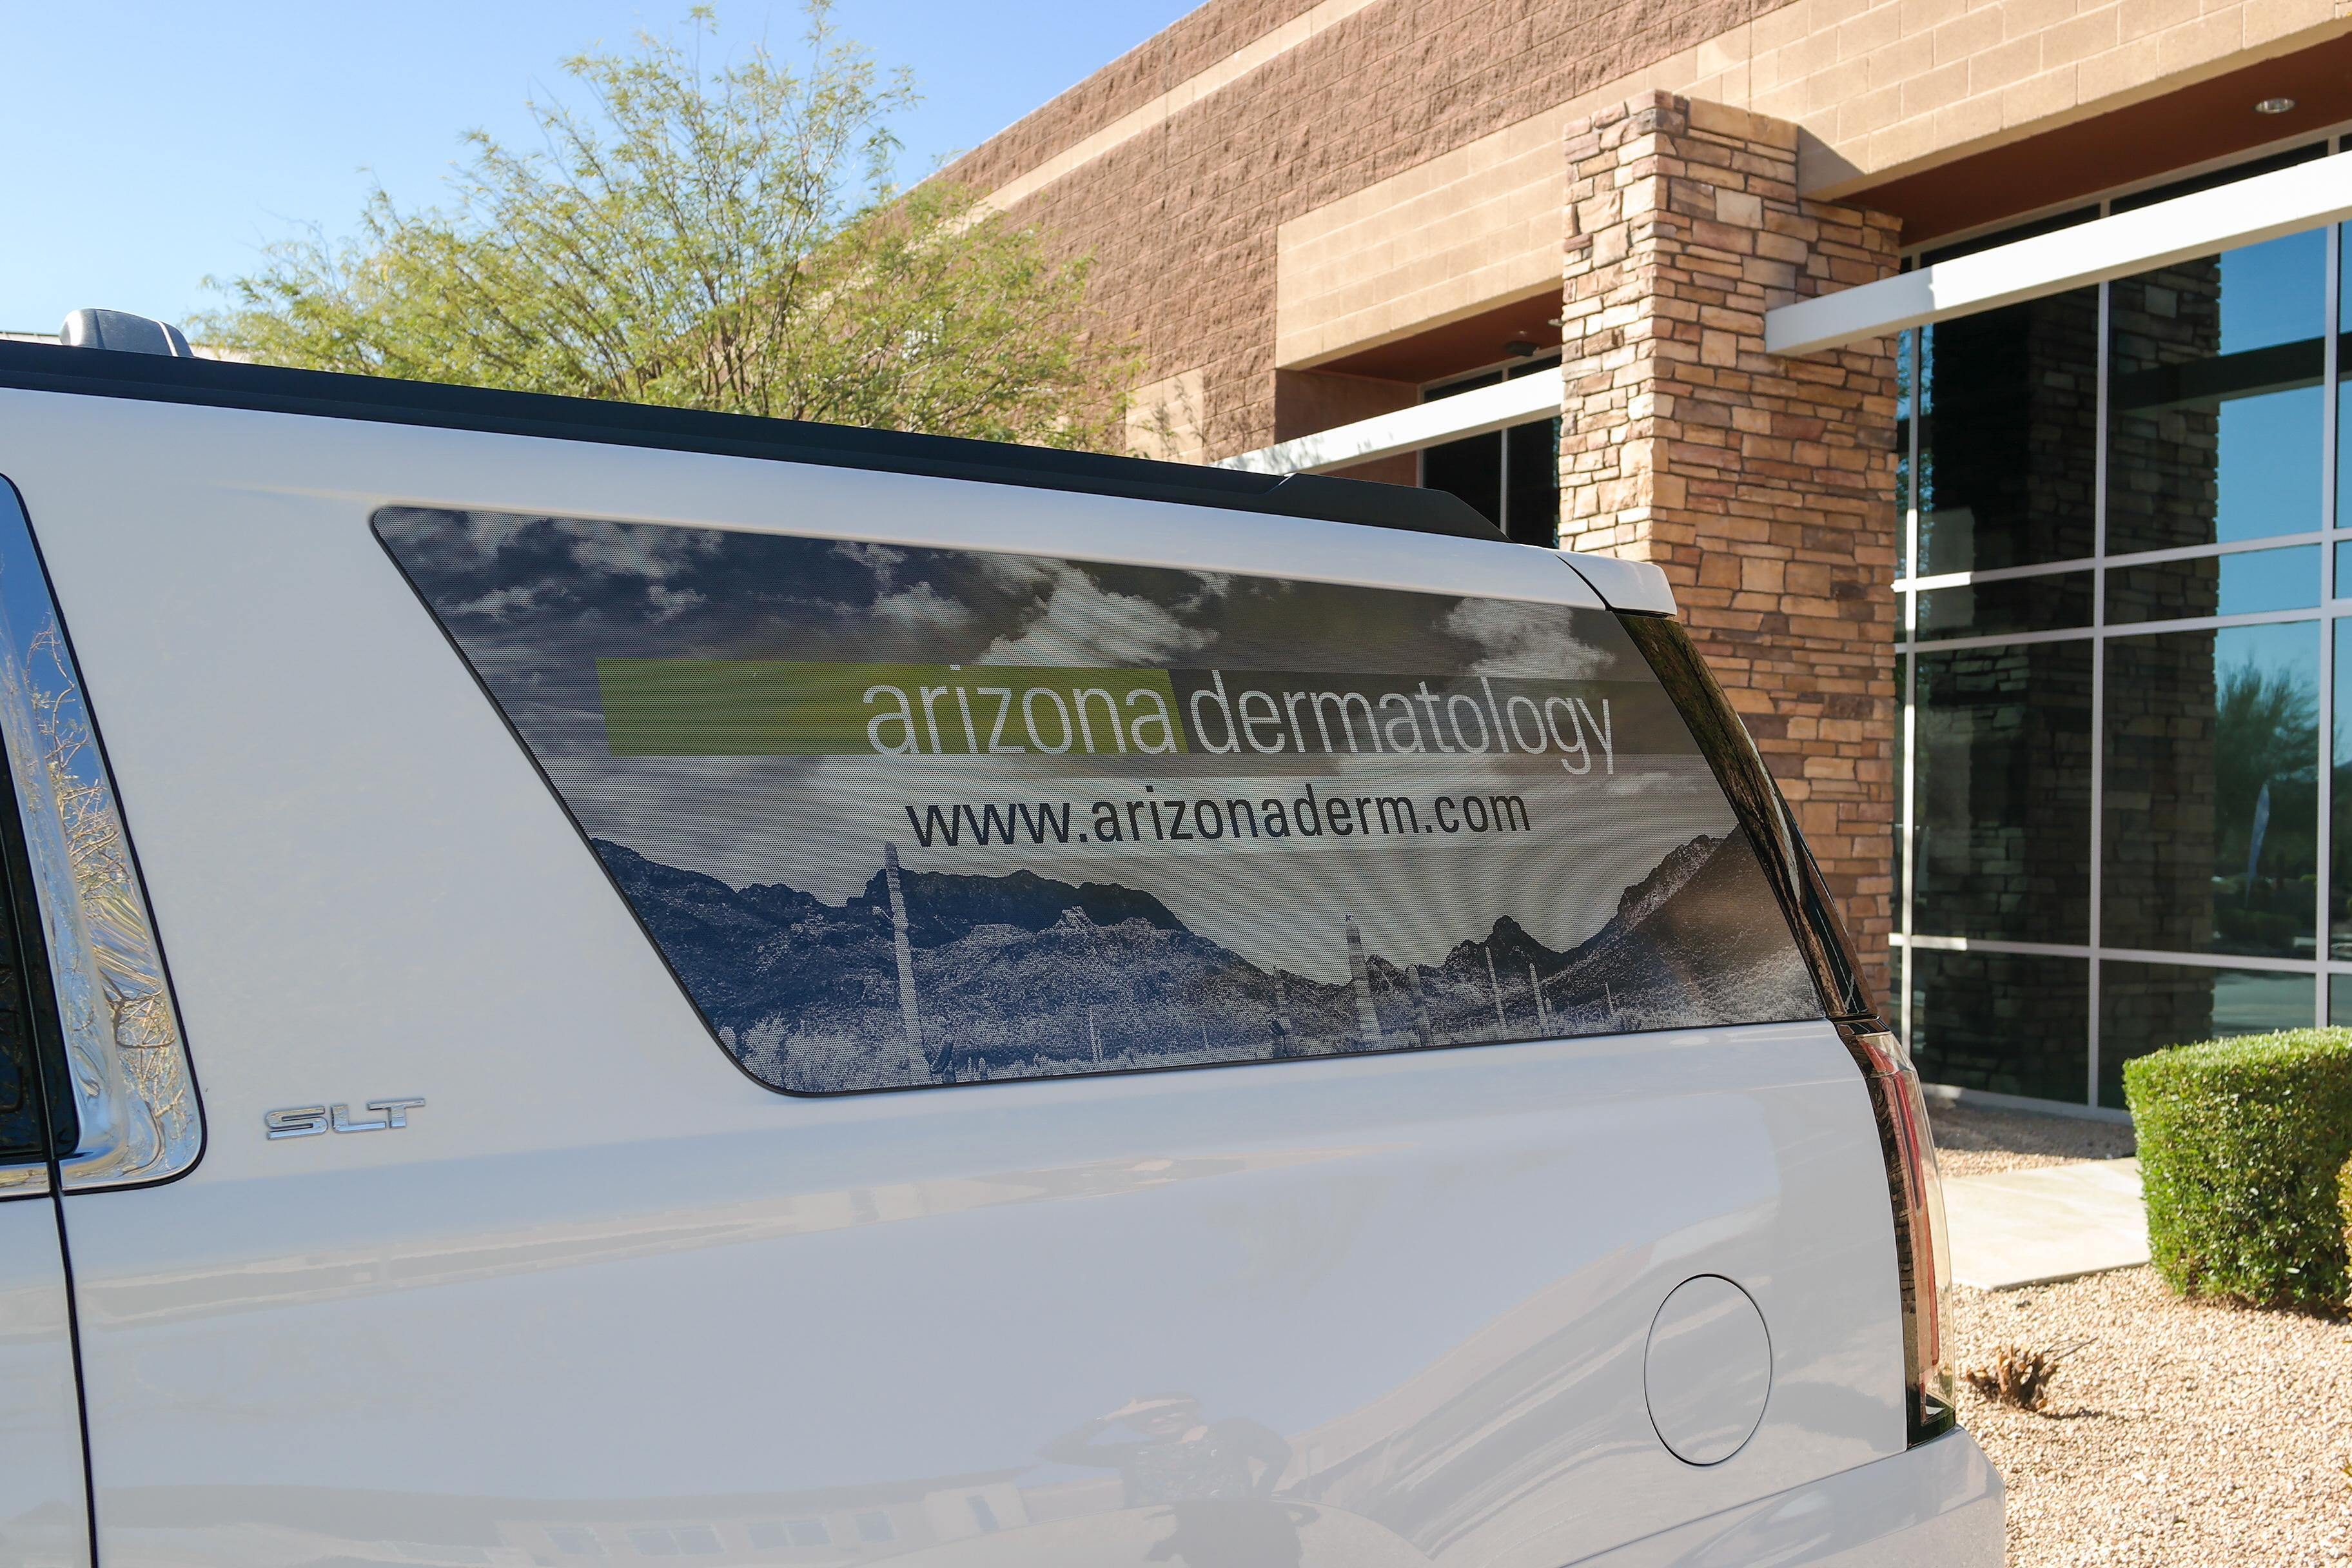 Arizona Dermatology Vehicle Window Wrap